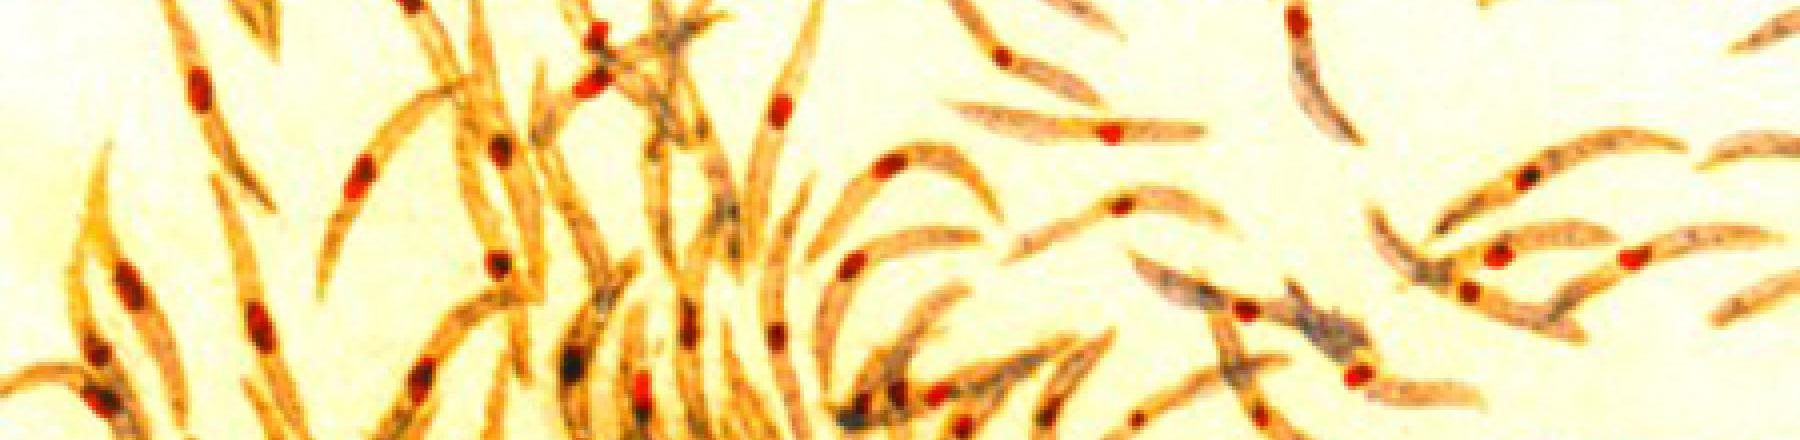 Malaria sporozoites. Photo credit: NIAID, WikiCommons 2015, CC-BY2.0.